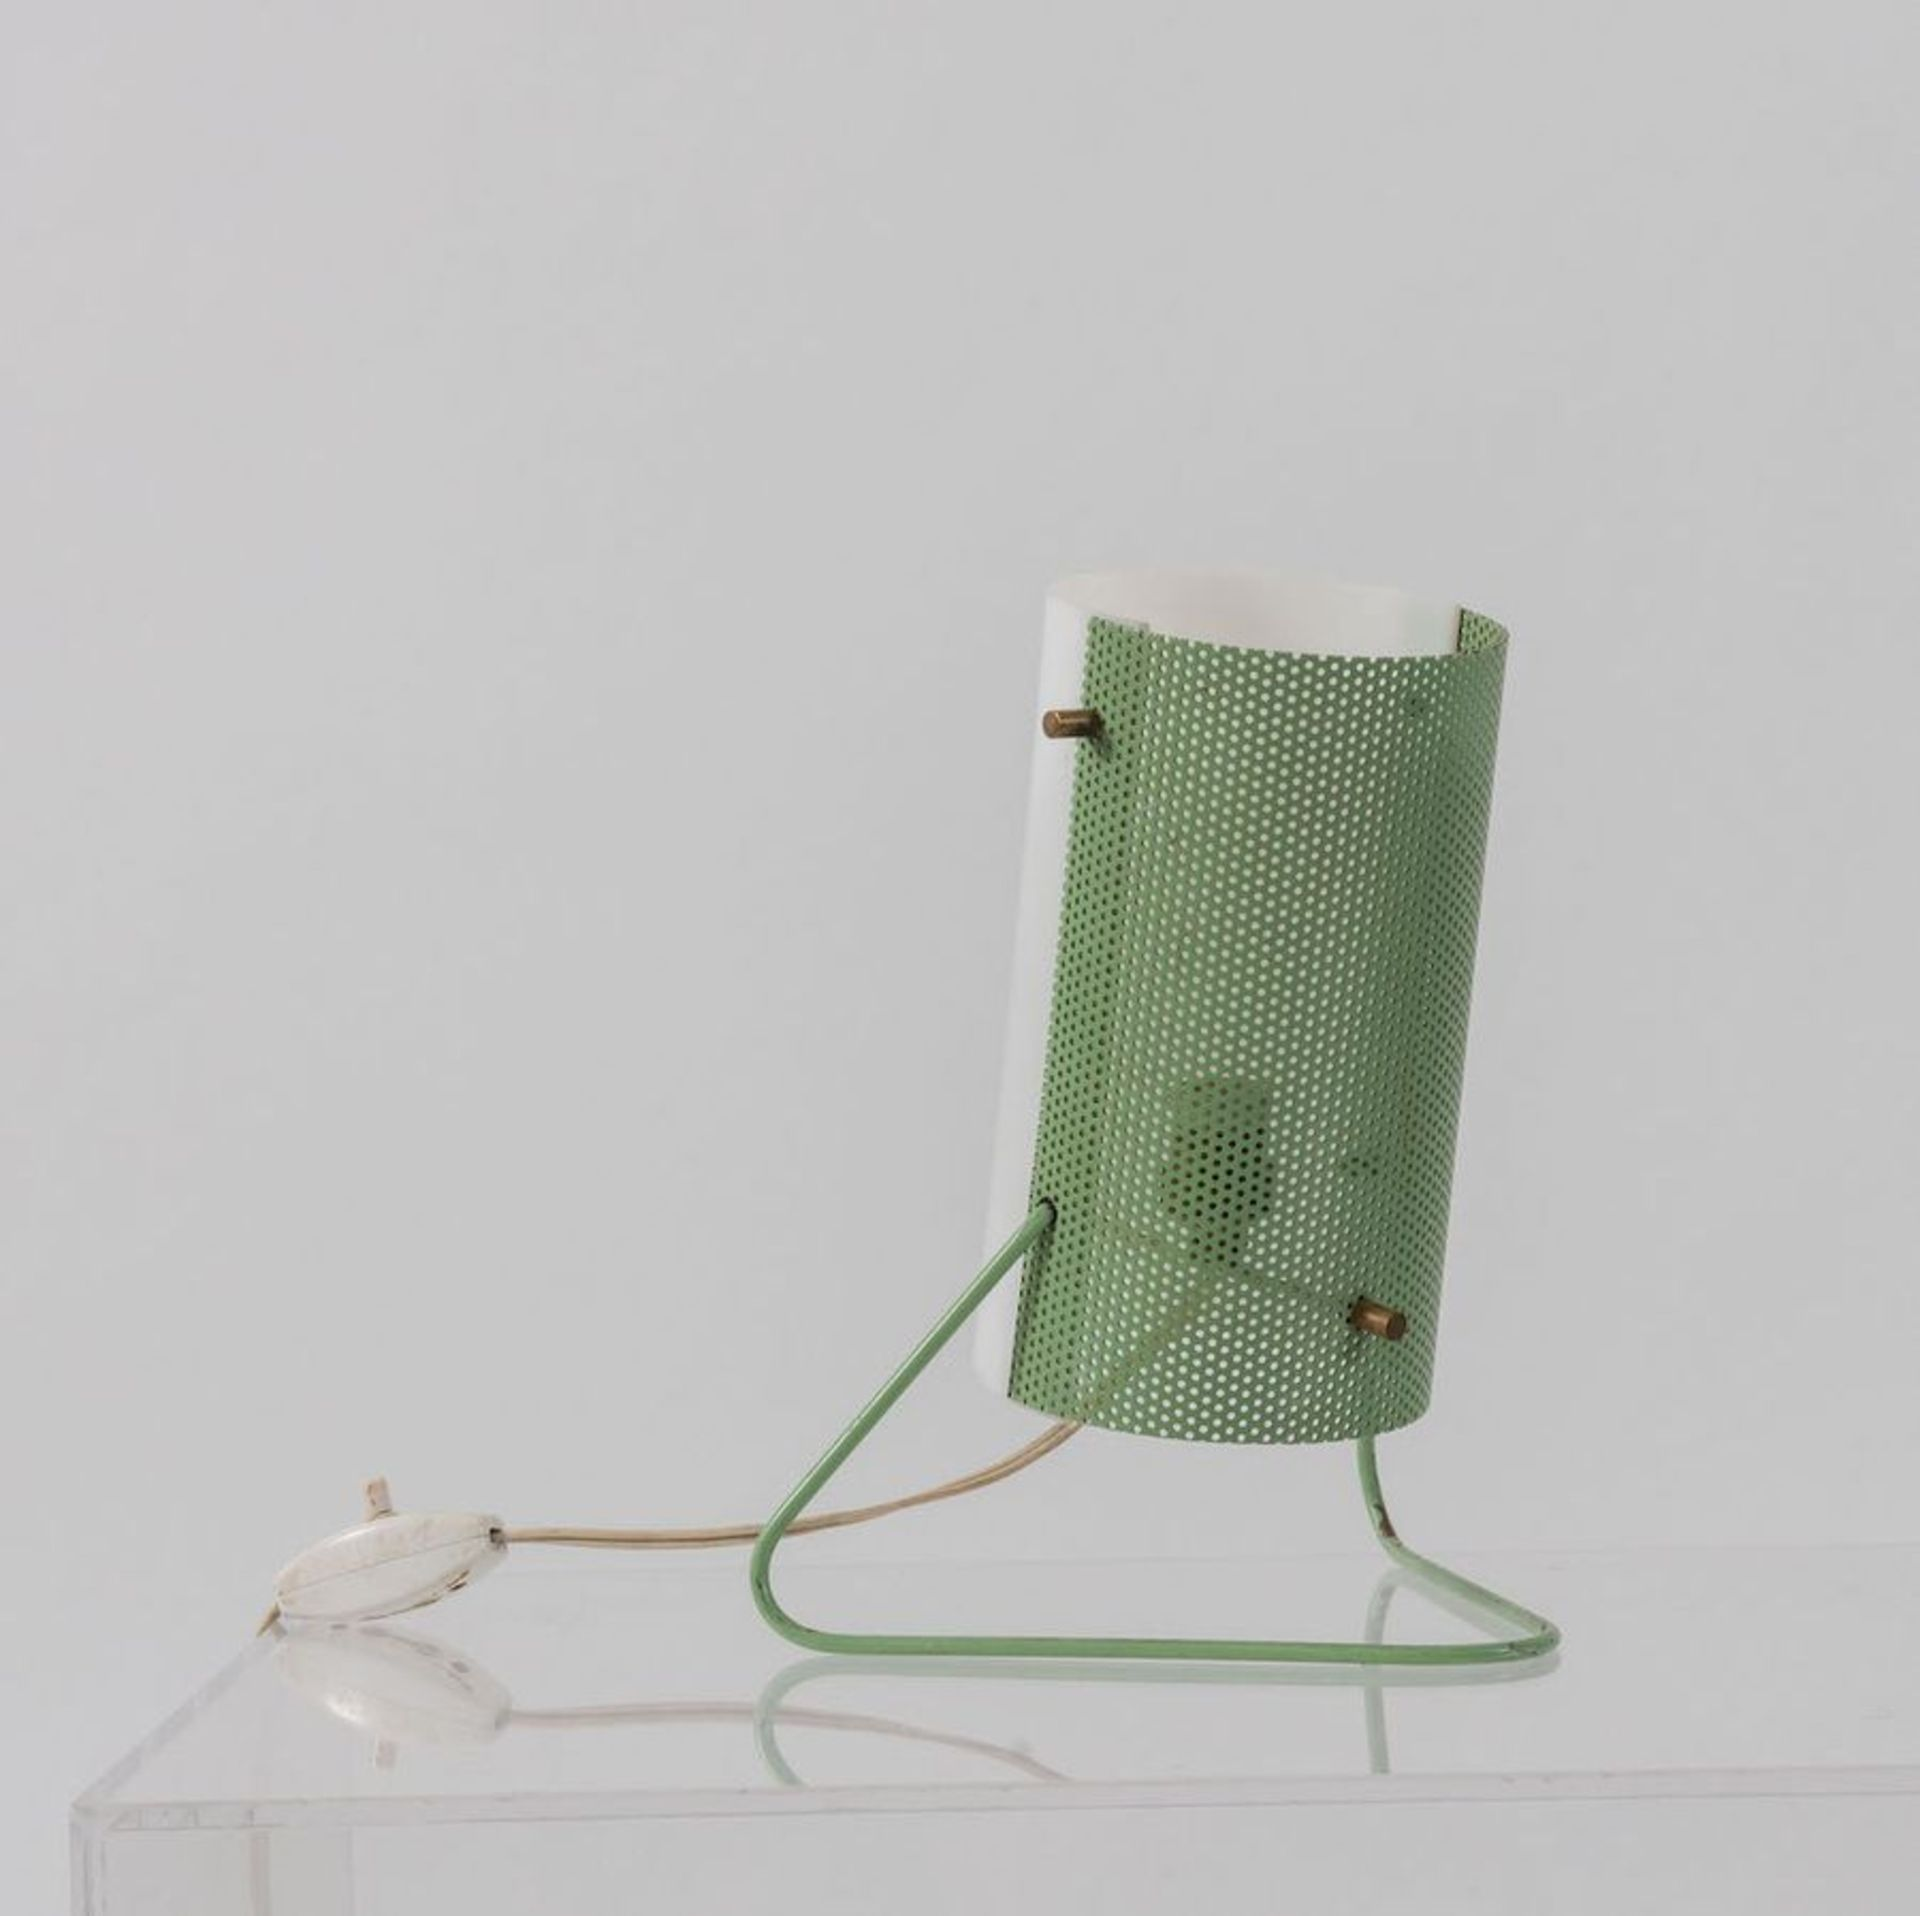 STILUX Lampada da tavolo in metallo perforato e perspex. Prod. Stilux, Italia, 1960 ca. Cm 22x17x15. - Bild 2 aus 3